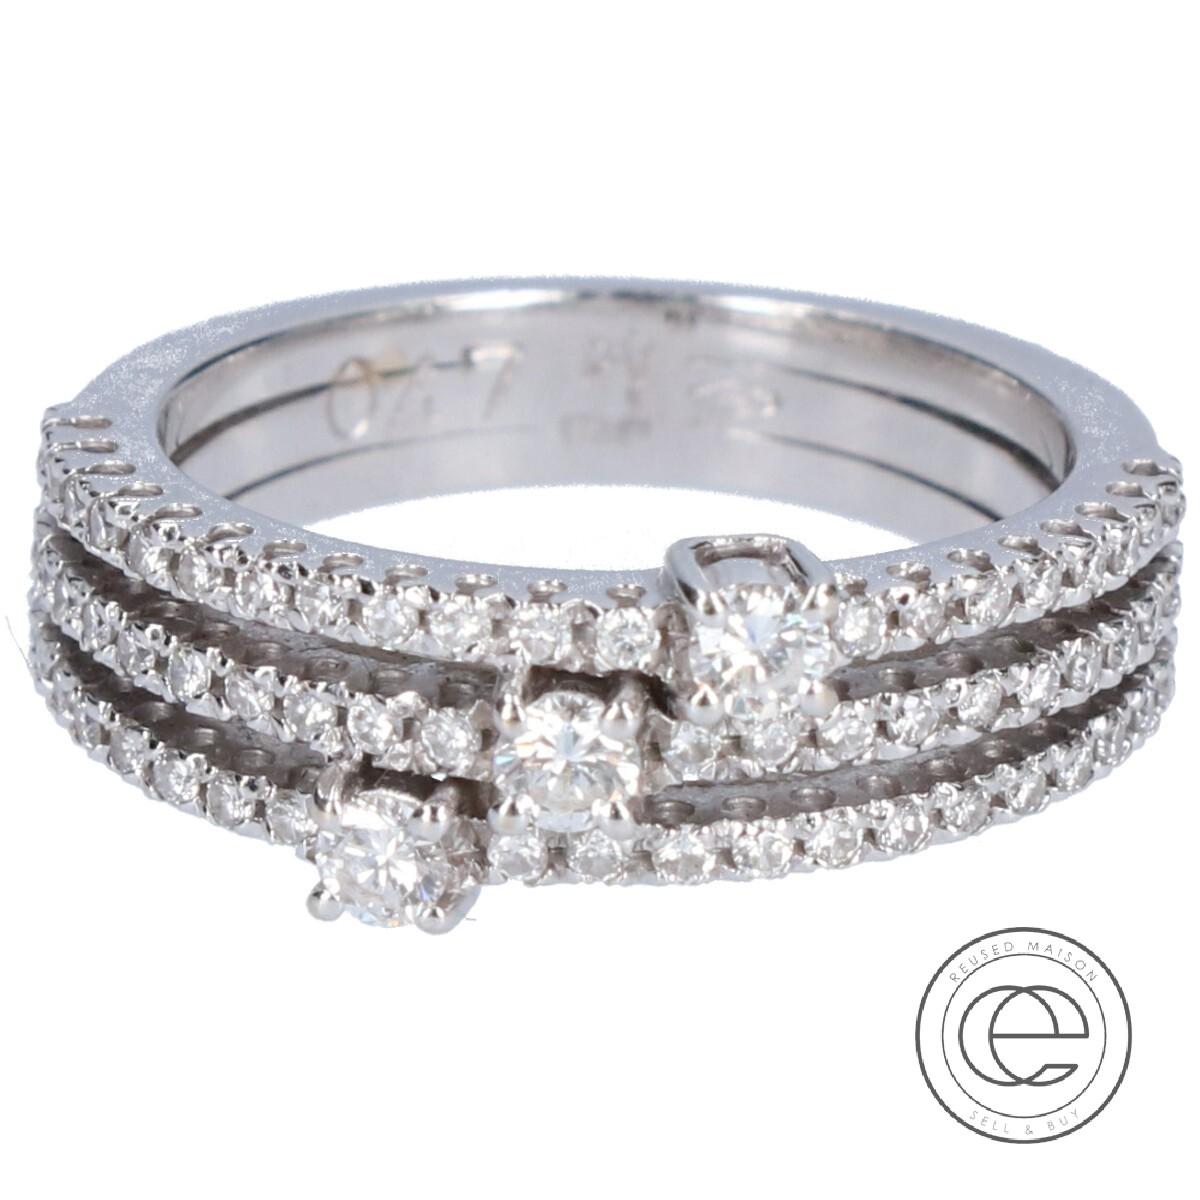 Ponte Vecchio ポンテヴェキオ K18WG ダイヤモンド 3連デザイン リング10号 指輪 ホワイトゴールド レディース 【中古】